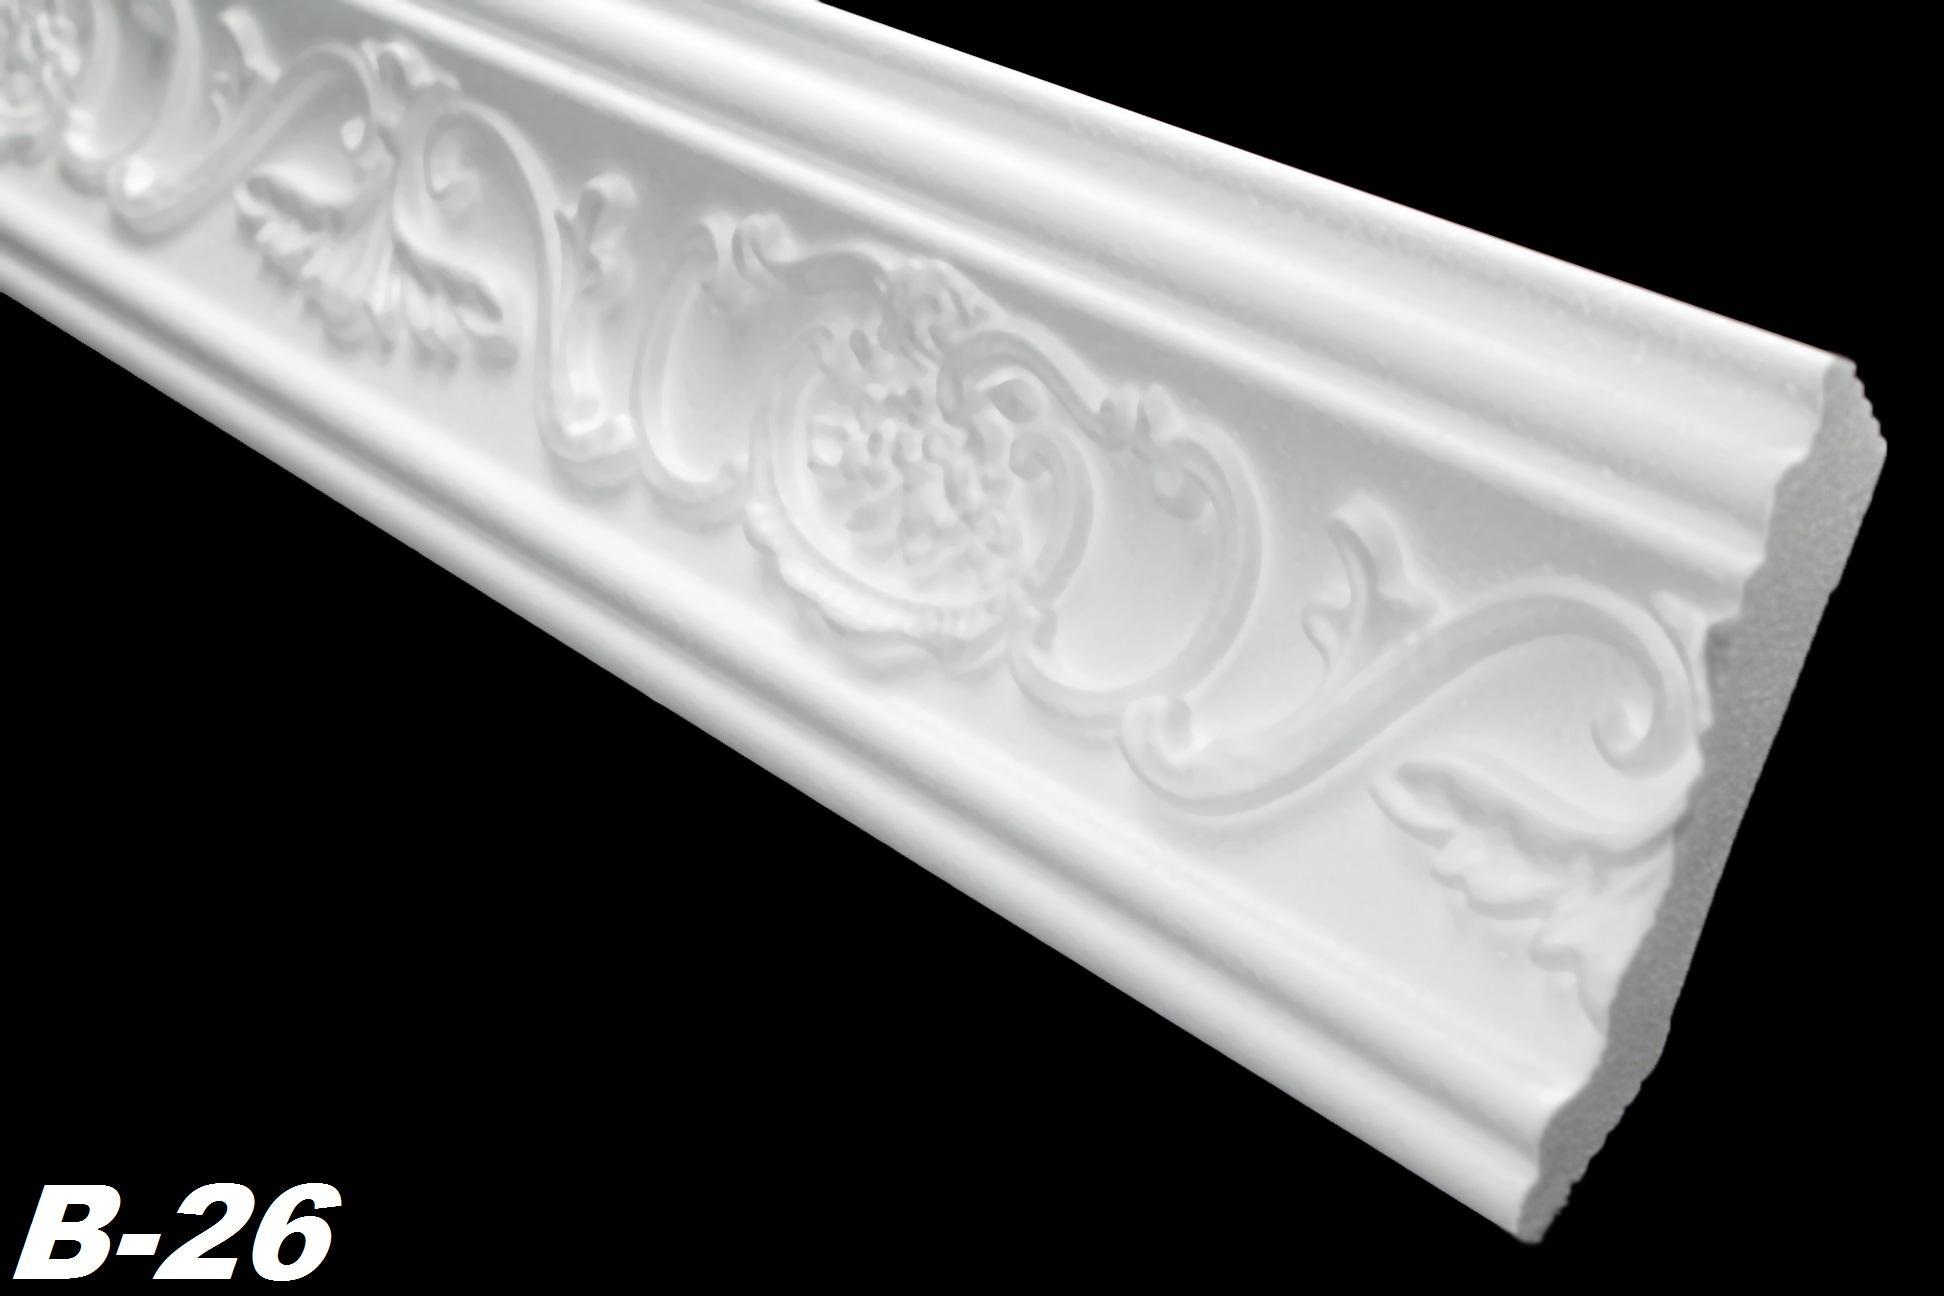 40 m tres corniches moulures d coratives plinthes stuc d coration polystyr ne ebay. Black Bedroom Furniture Sets. Home Design Ideas